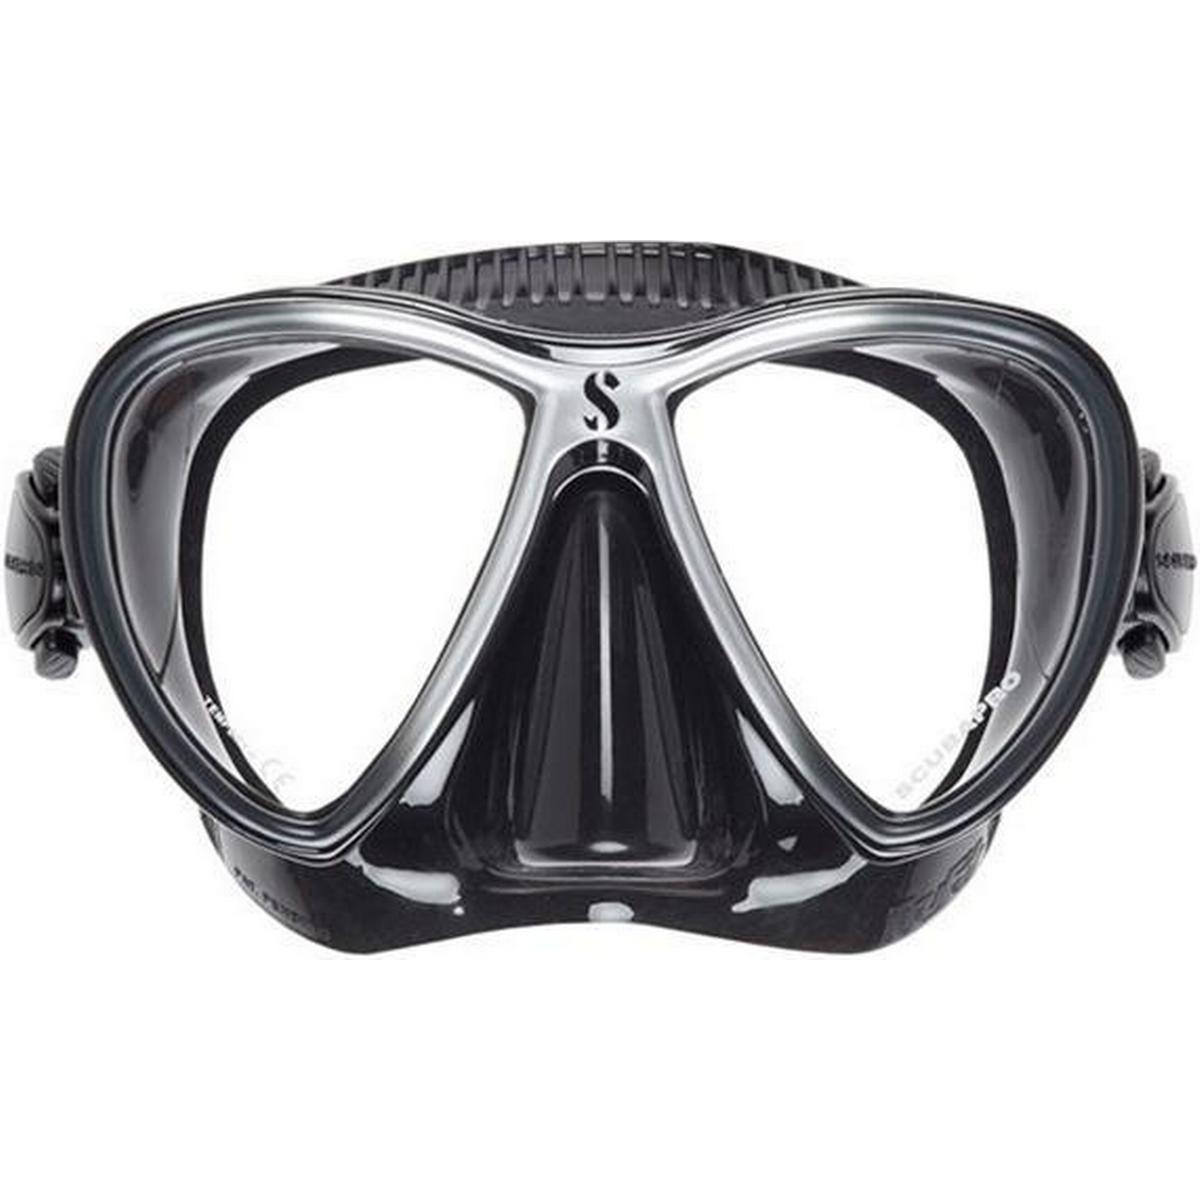 0fcd8137cb9 Scubapro Dykkermaske - Sammenlign priser hos PriceRunner